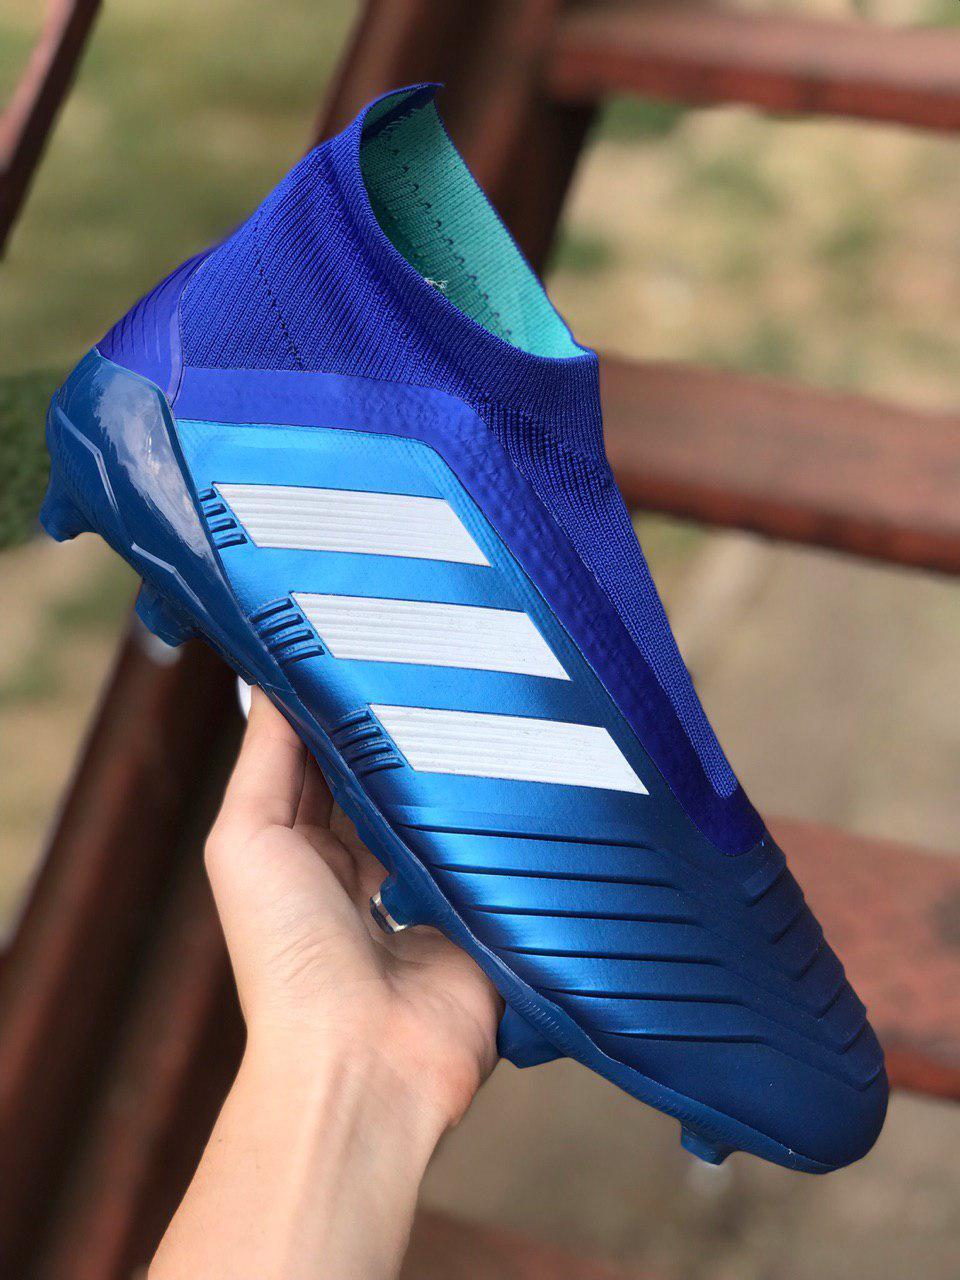 Бутсы Adidas Predator 18+FG/адидас предатор без шнурков (реплика) 5511